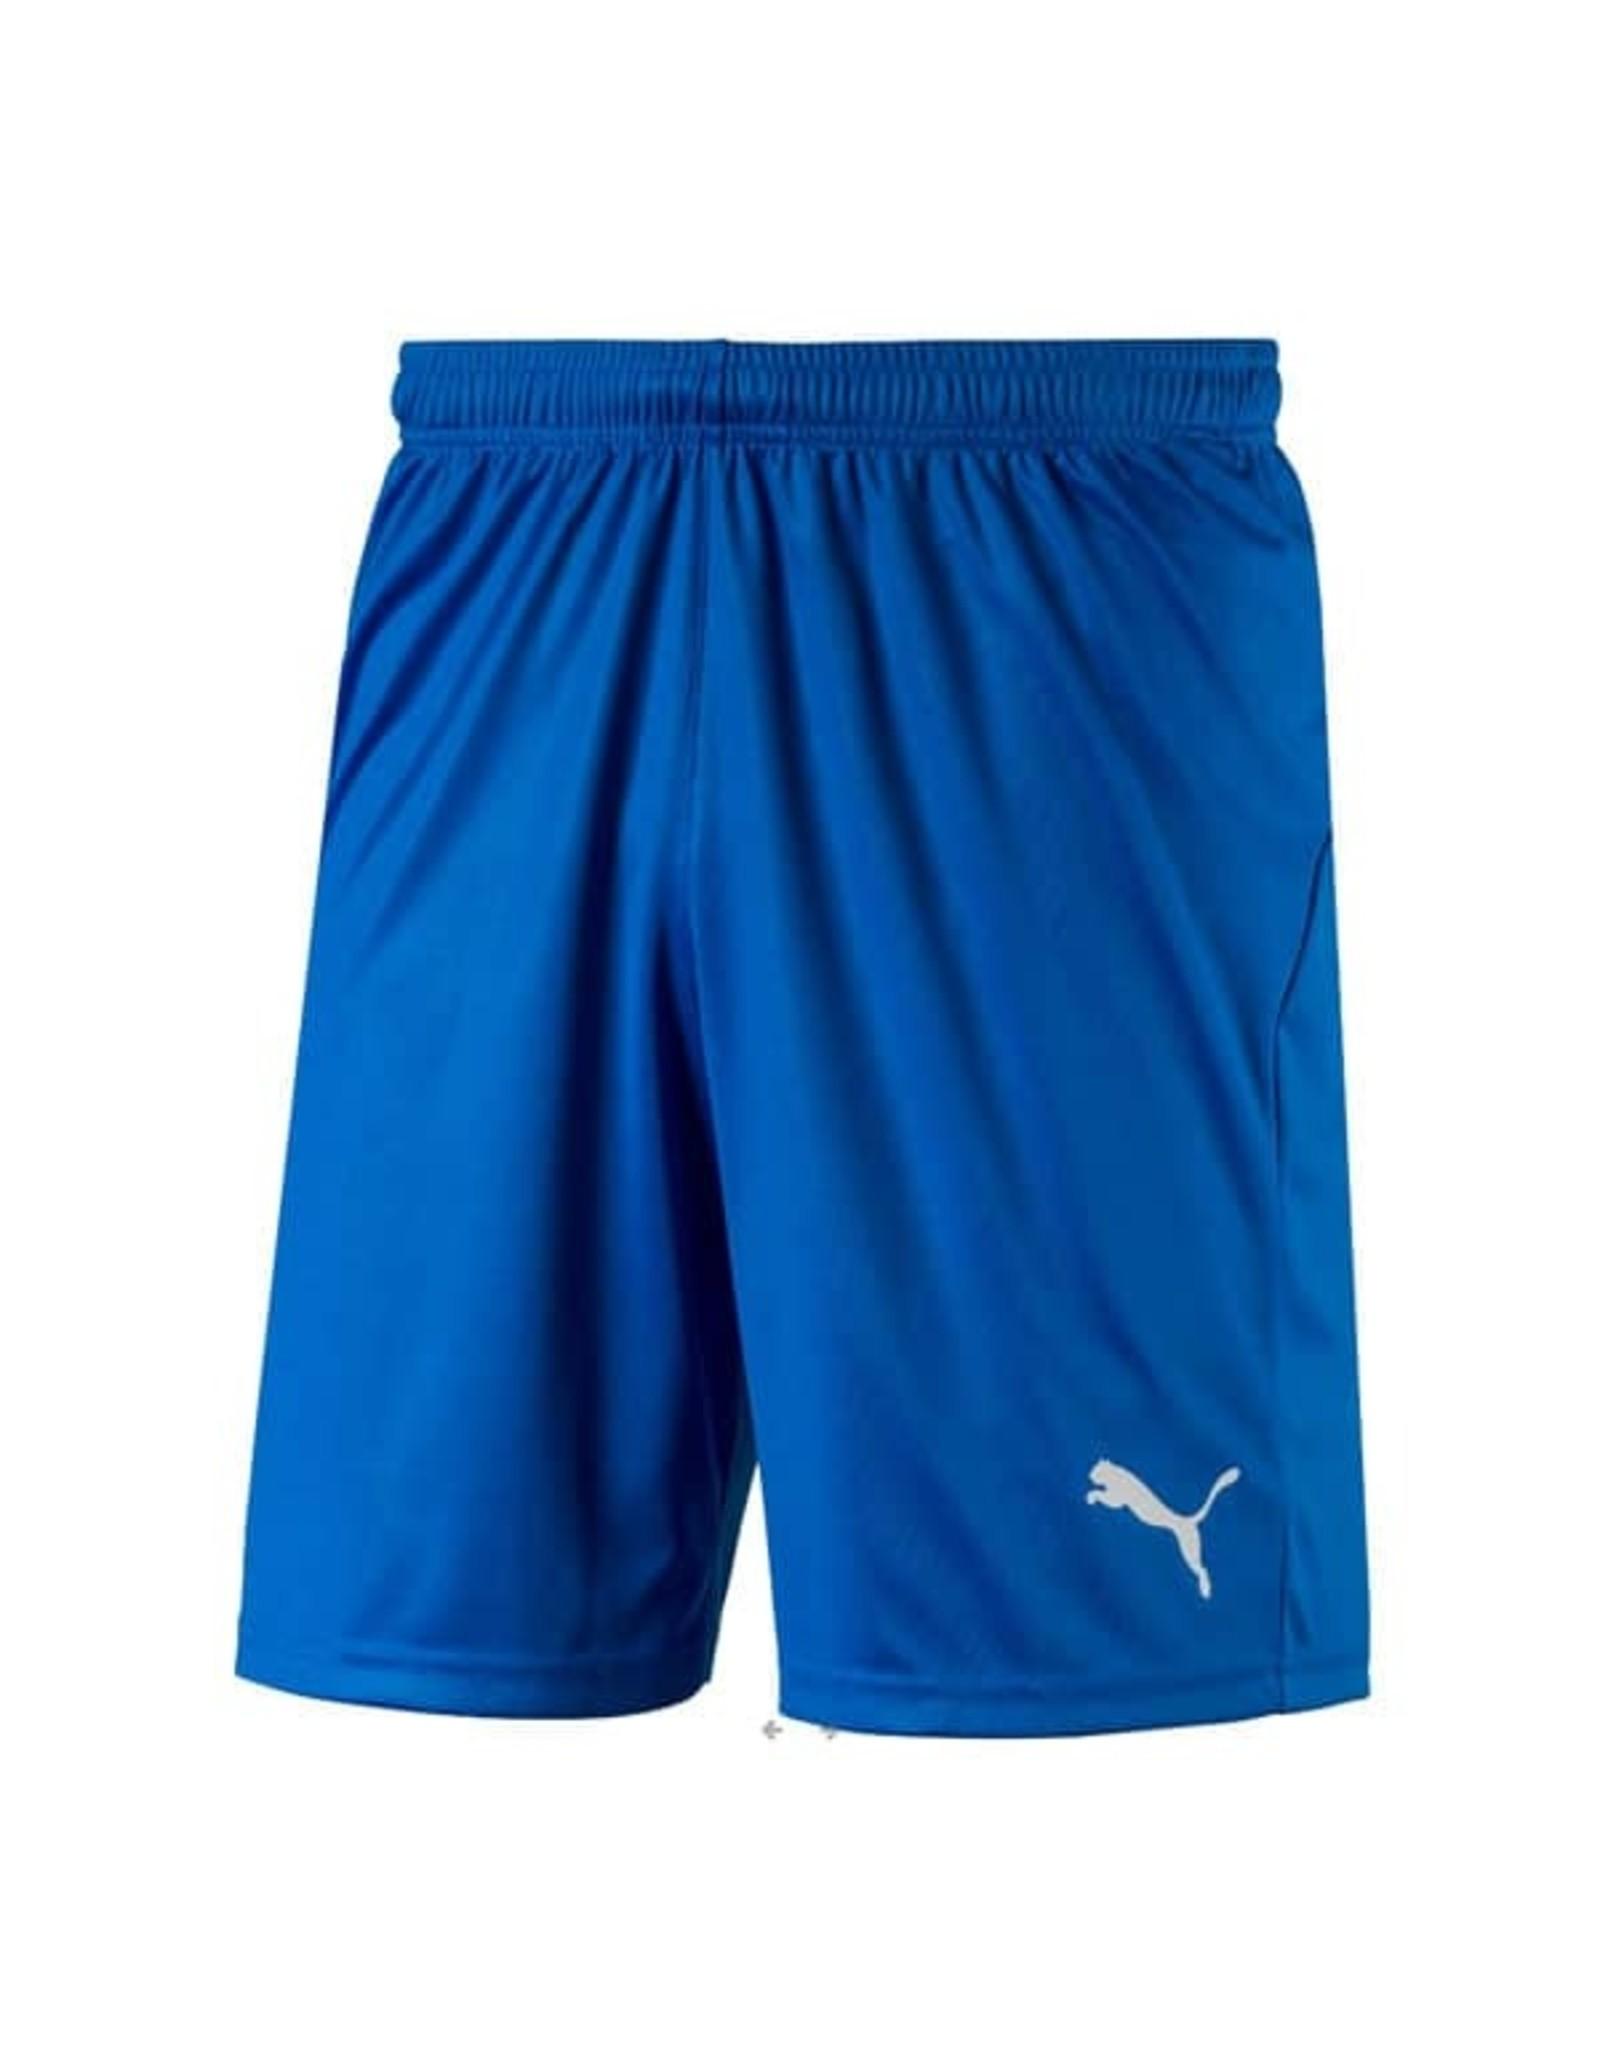 Adidas Puma LIGA Shorts Core (Blue)